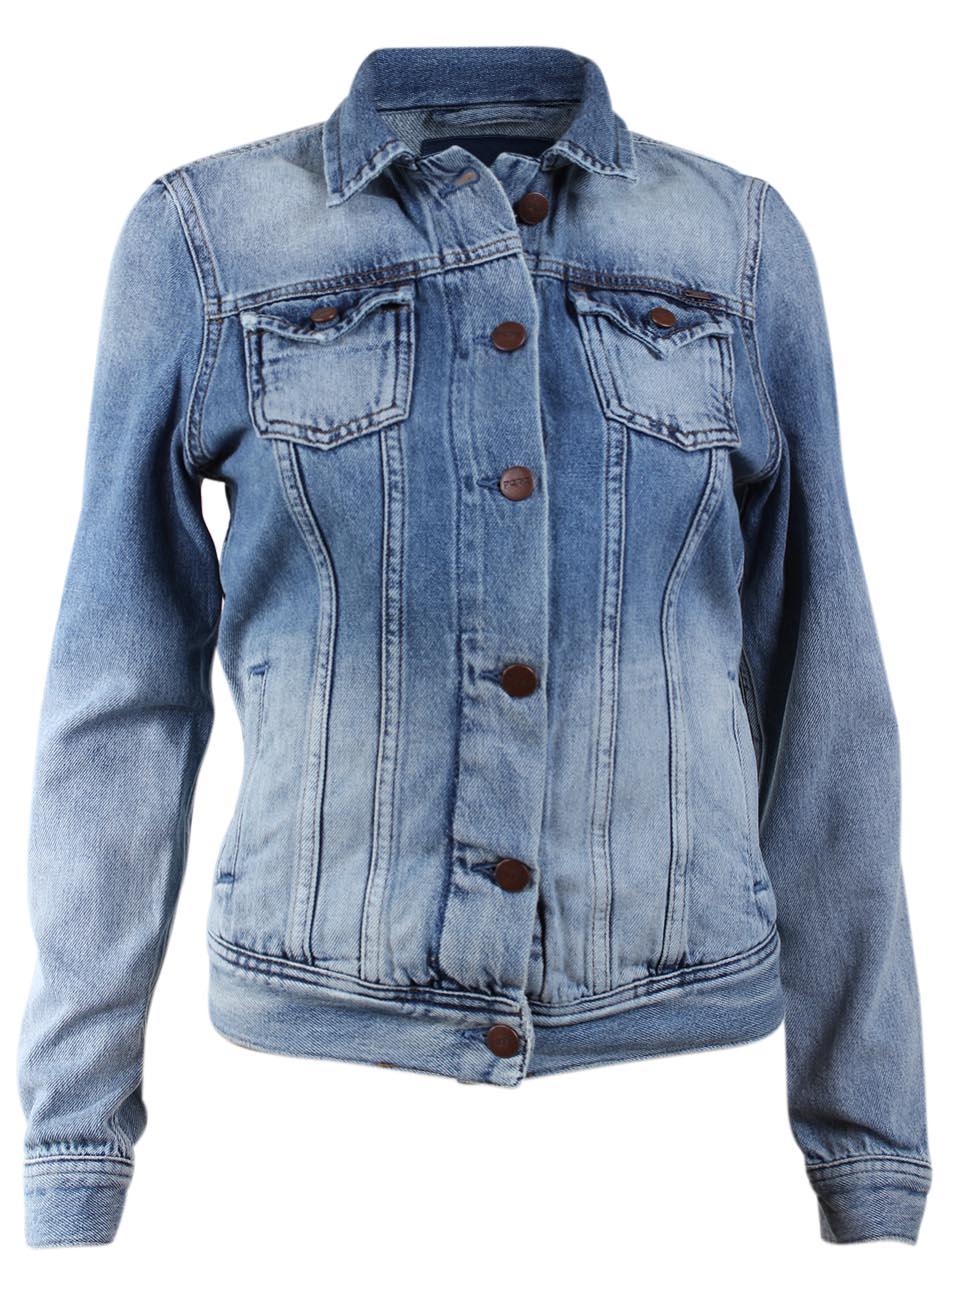 pepe jeans london damen jeansjacke thrift blau denim. Black Bedroom Furniture Sets. Home Design Ideas